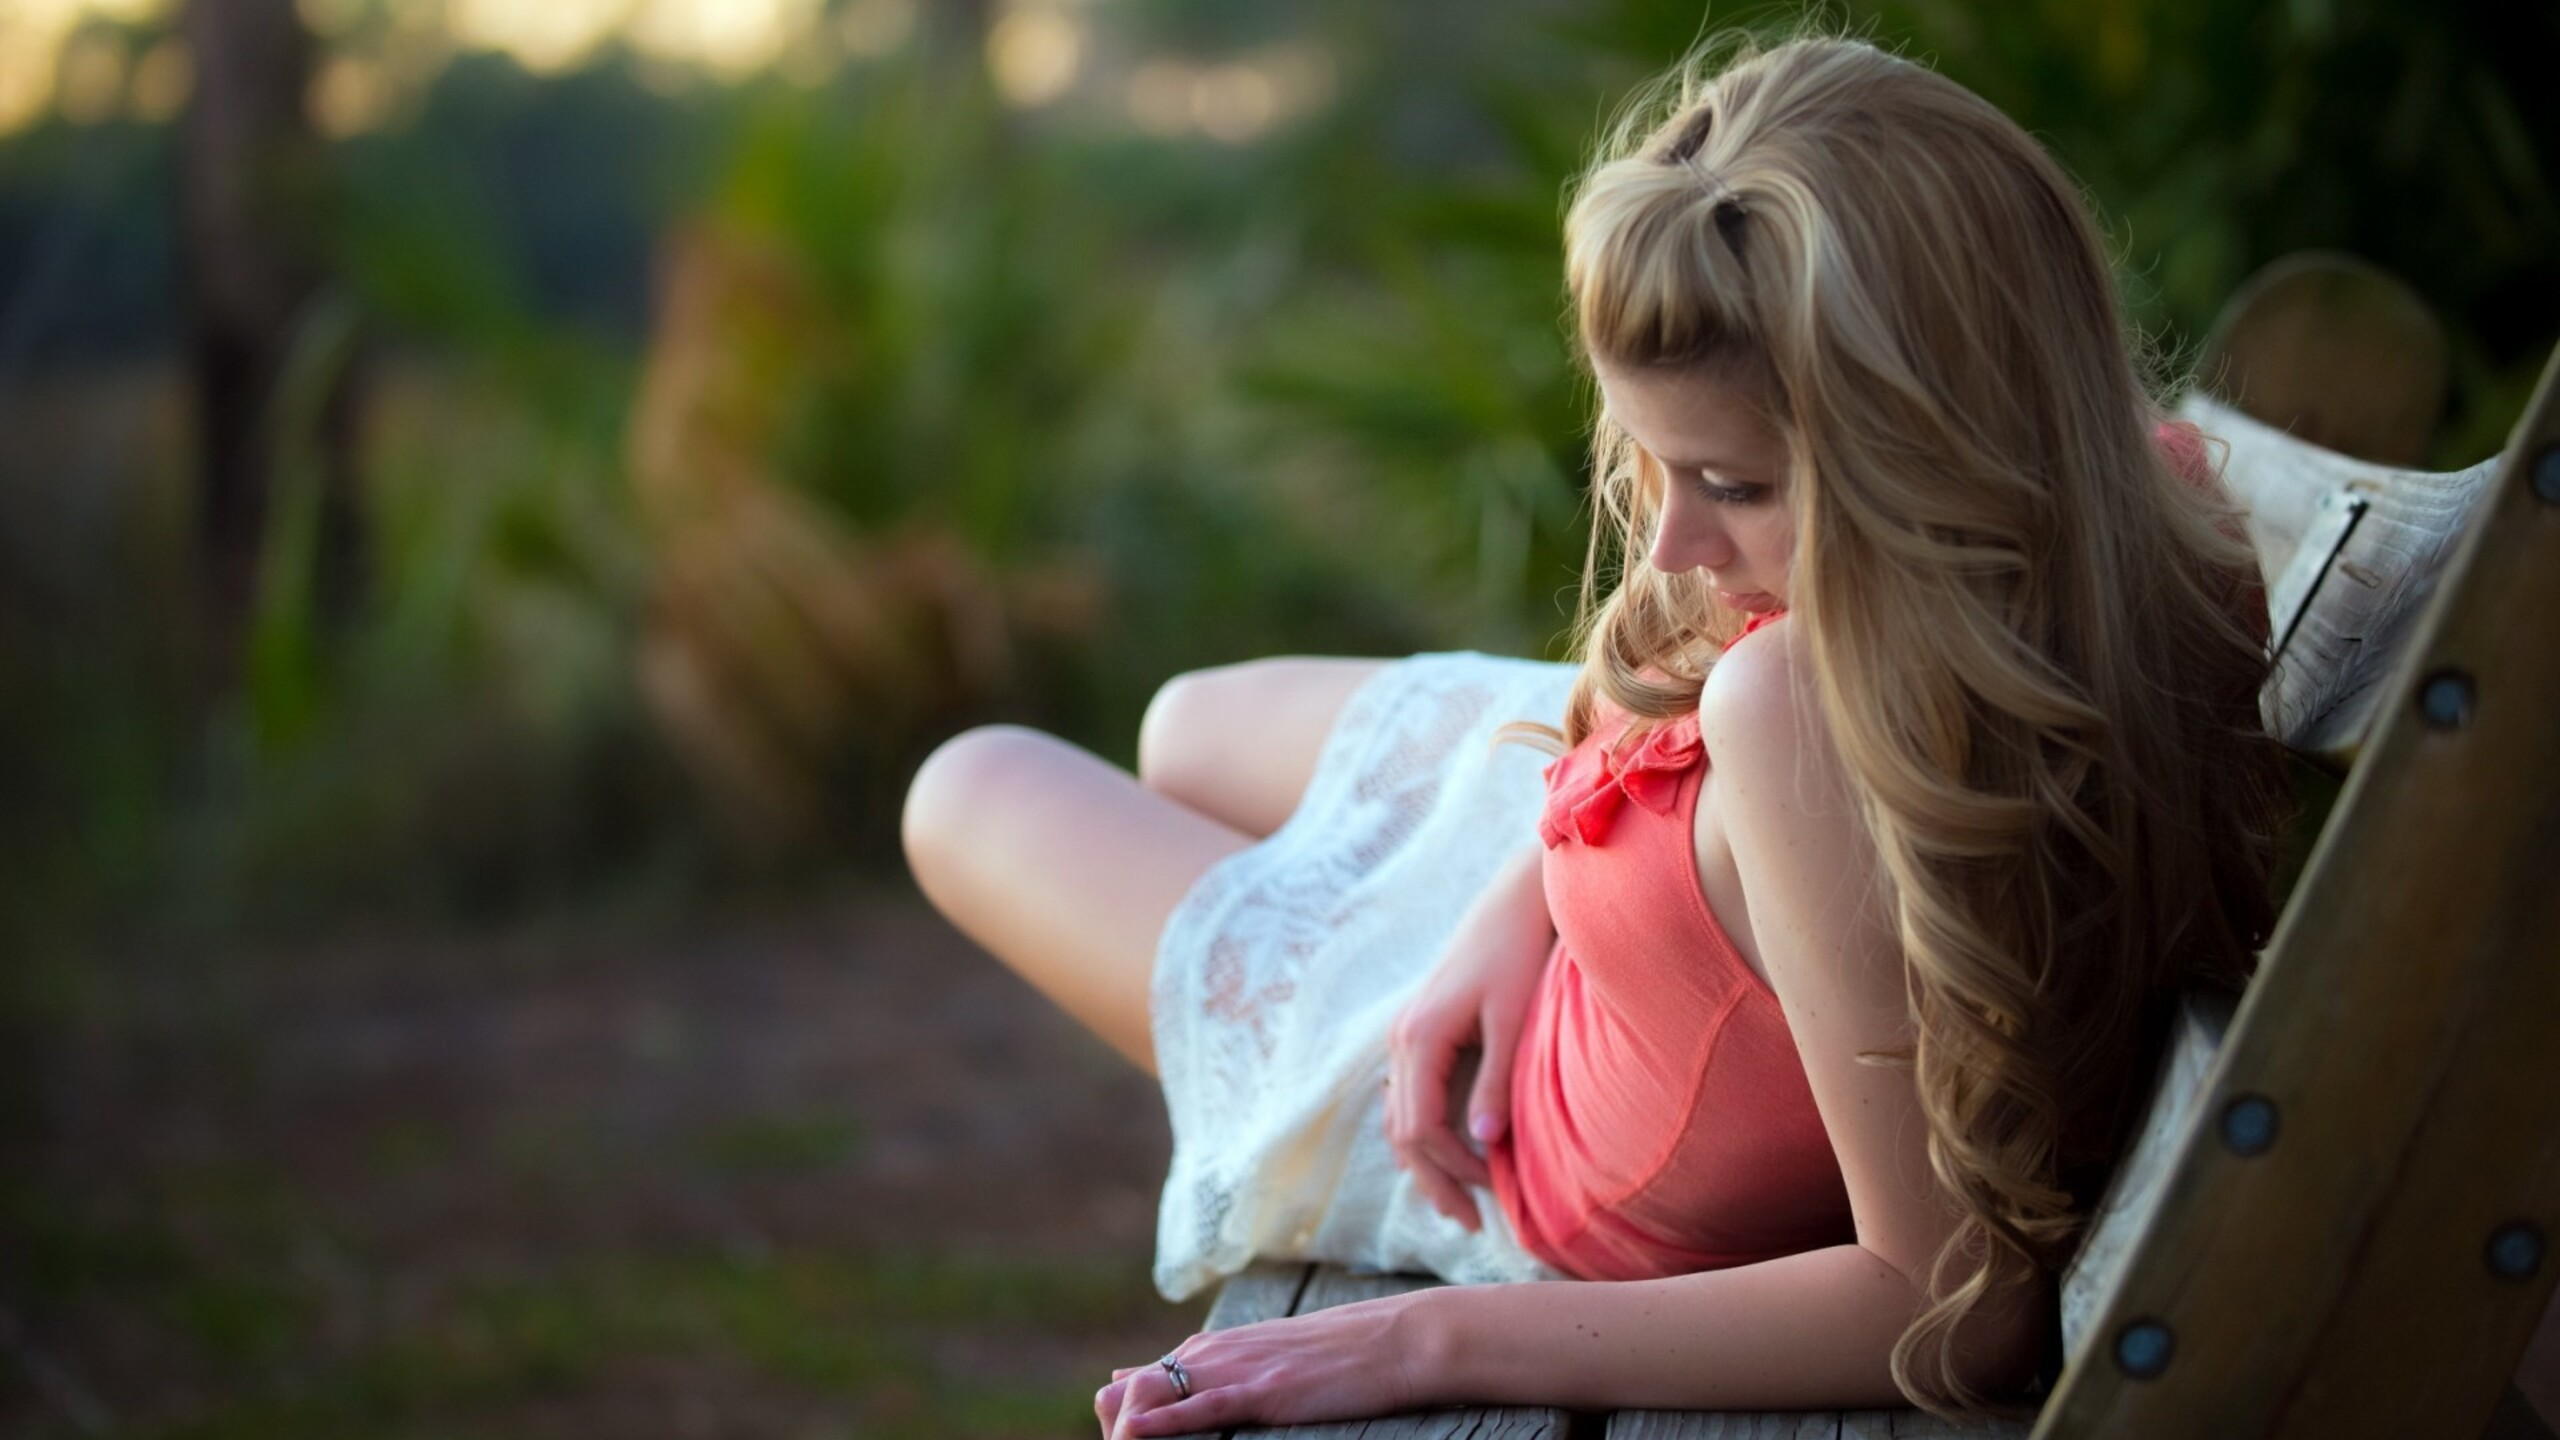 girl-lying-on-bench-pic.jpg